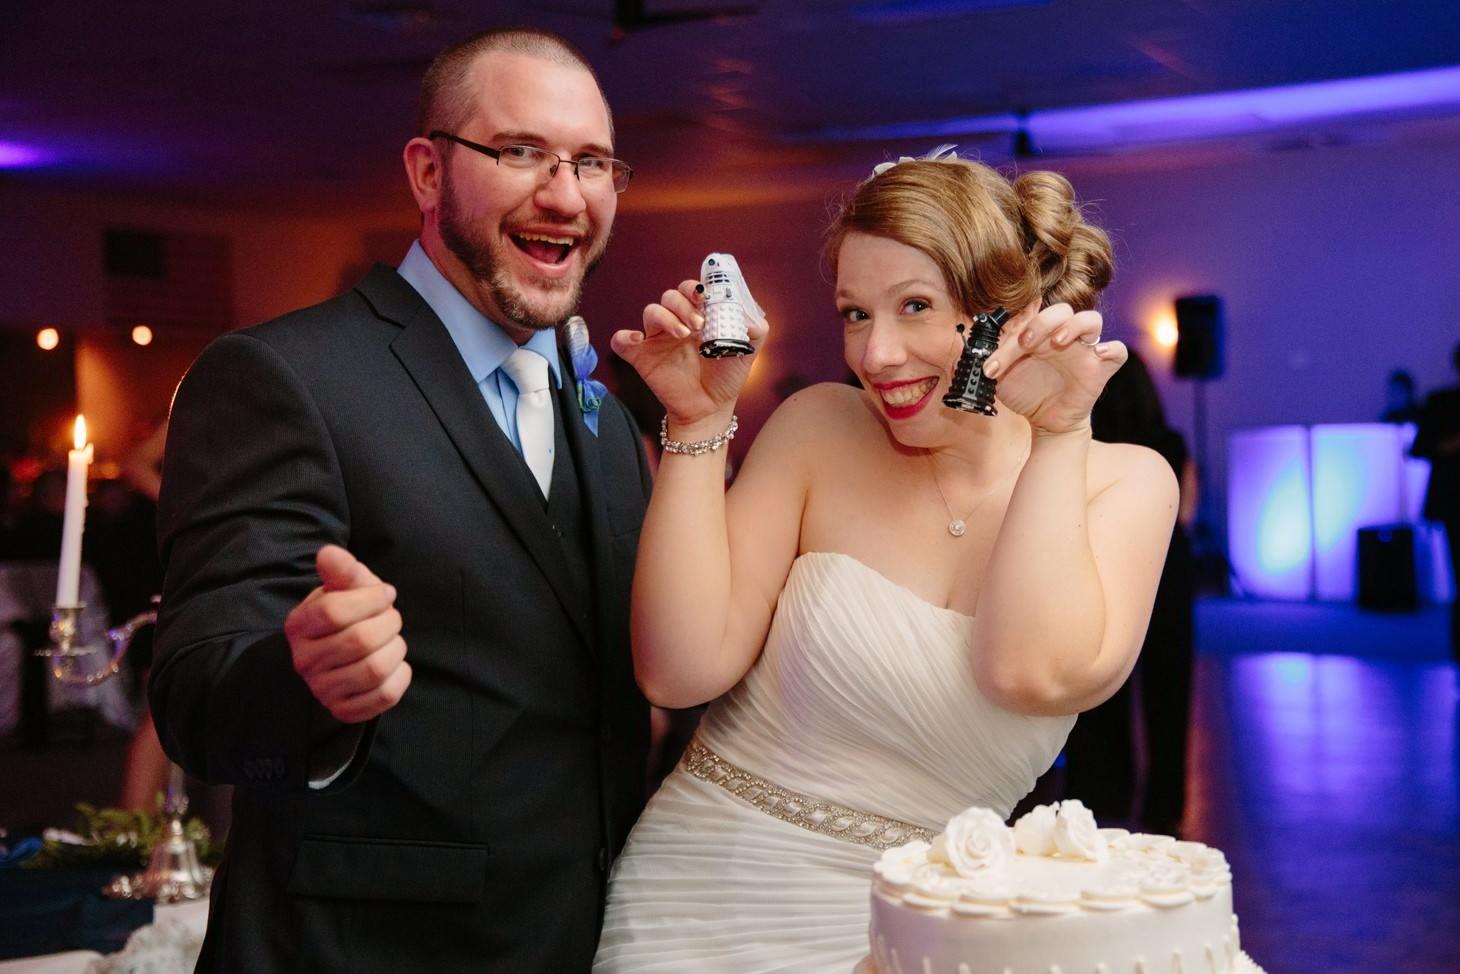 047-nyc-wedding-photographer-nj-nerdy-dr-who-firehouse-wedding-smitten-chickens.jpg